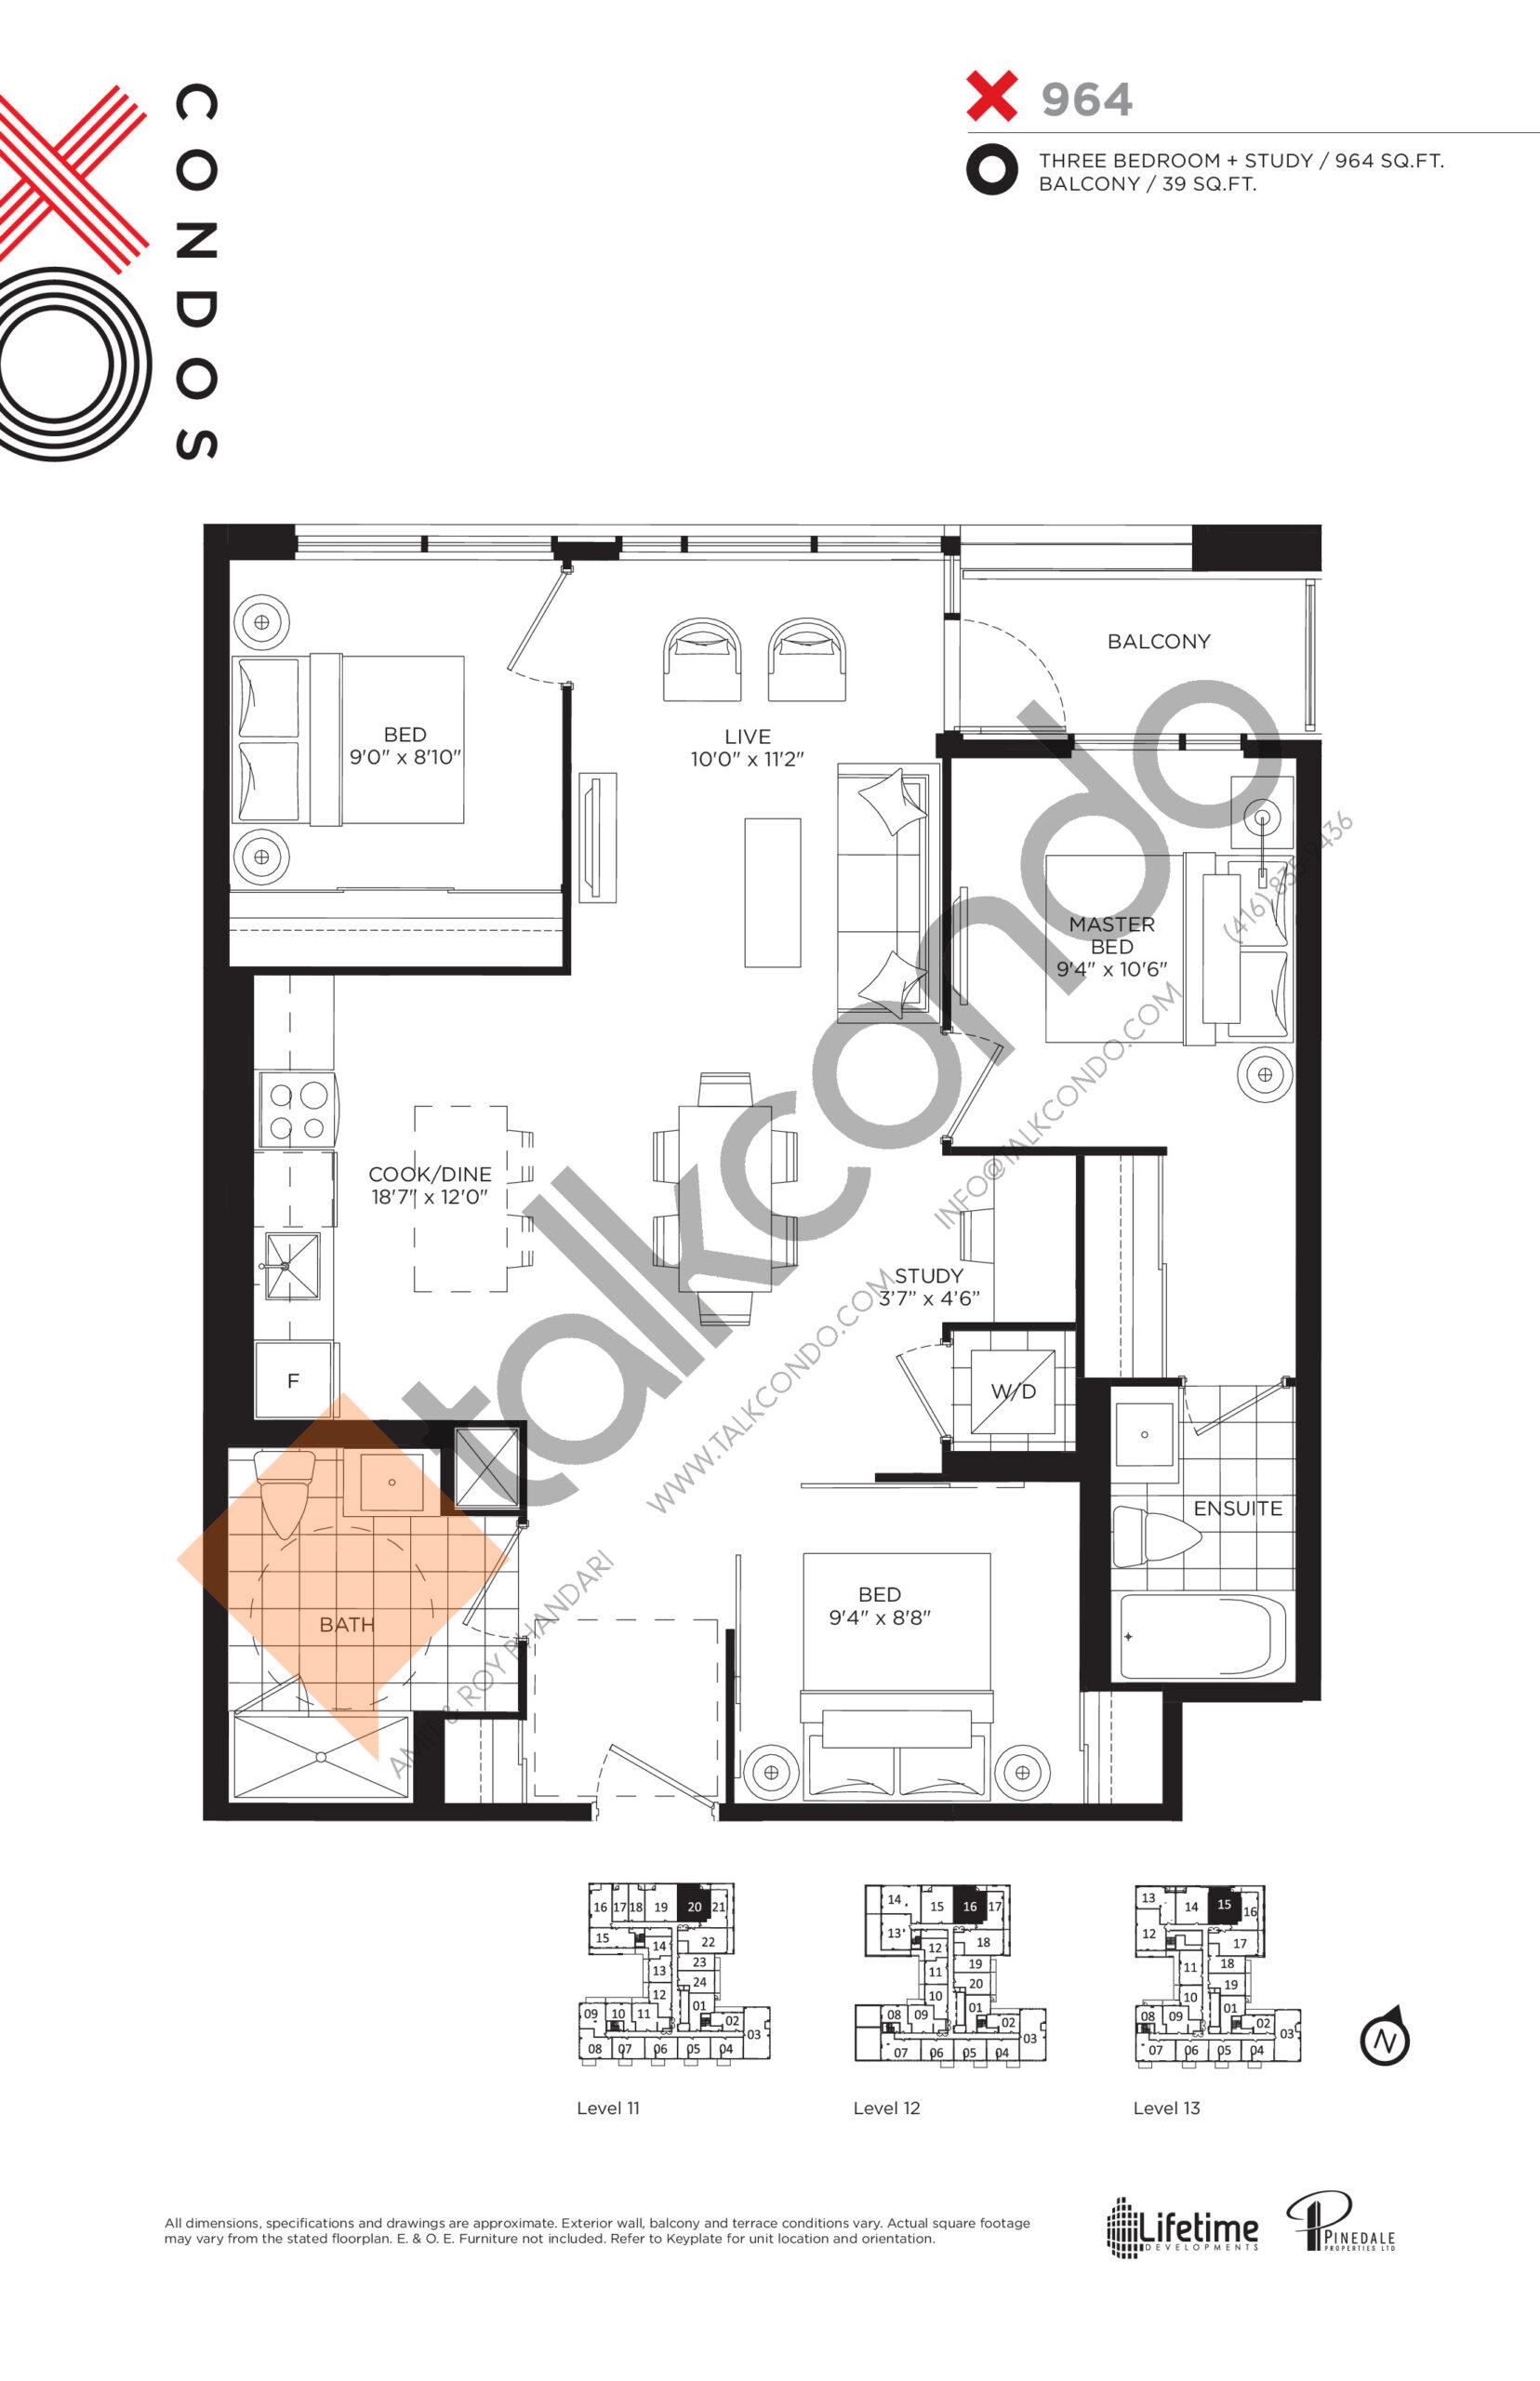 X964 (Platinum Collection) Floor Plan at XO Condos - 964 sq.ft